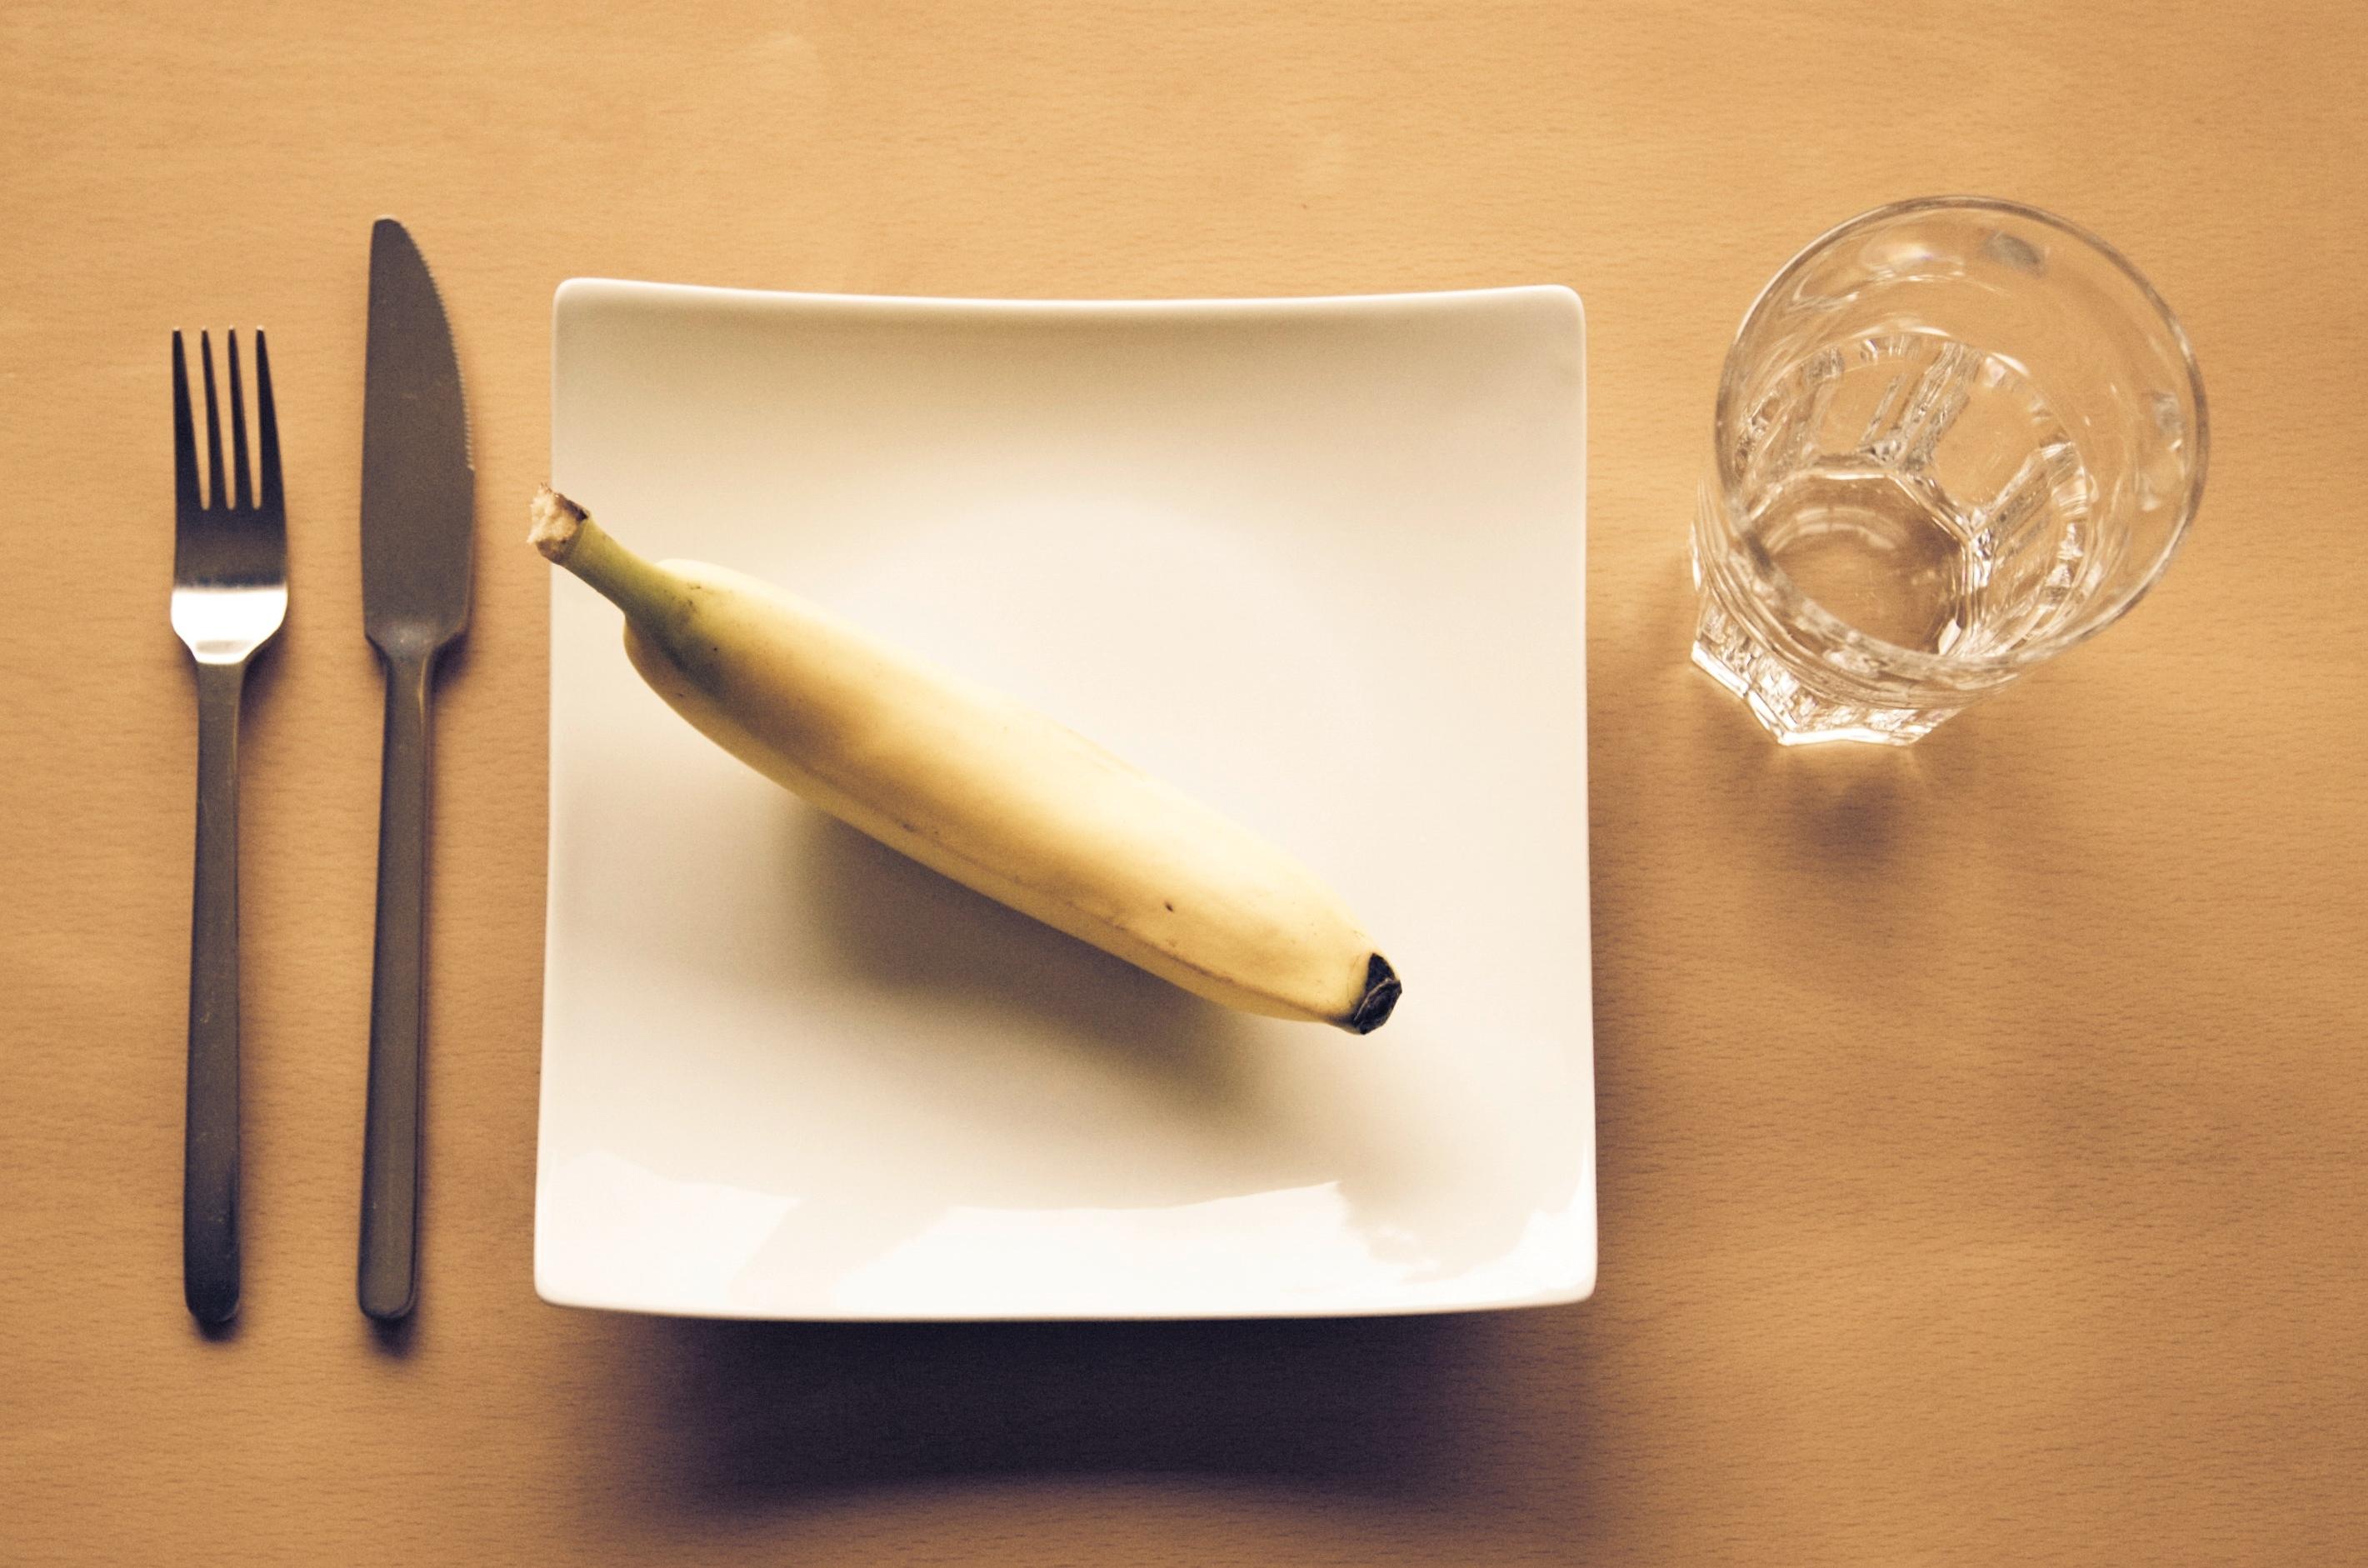 banana-diet-drinking-glass-94436